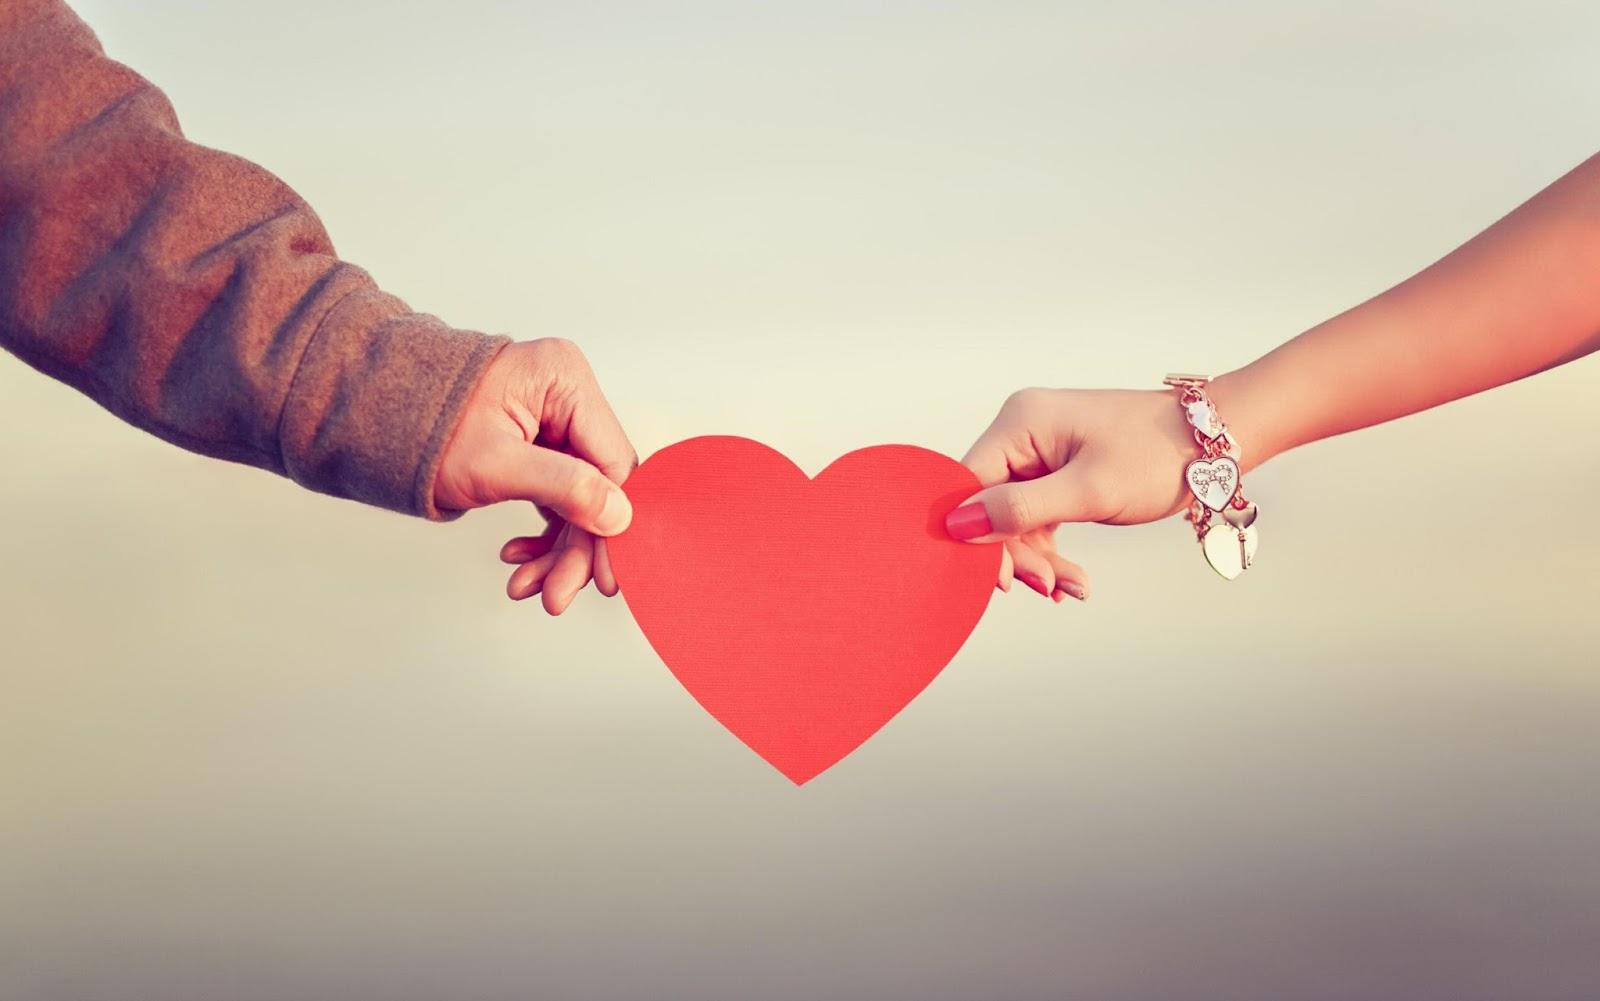 4 Basic Qualities Every Relationship Needs To Flourish